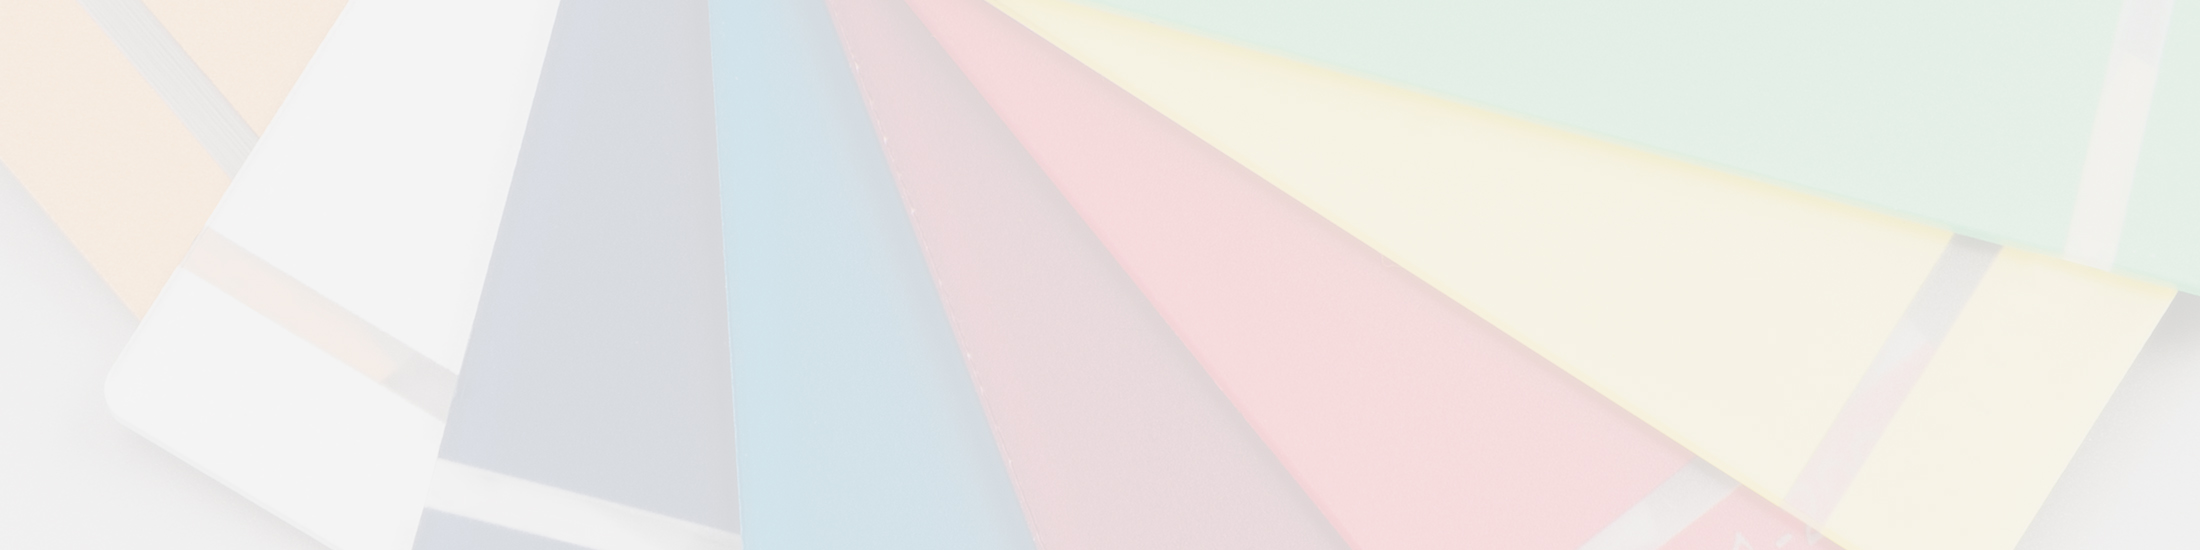 transparentes Acryl zum Gravieren TroGlass